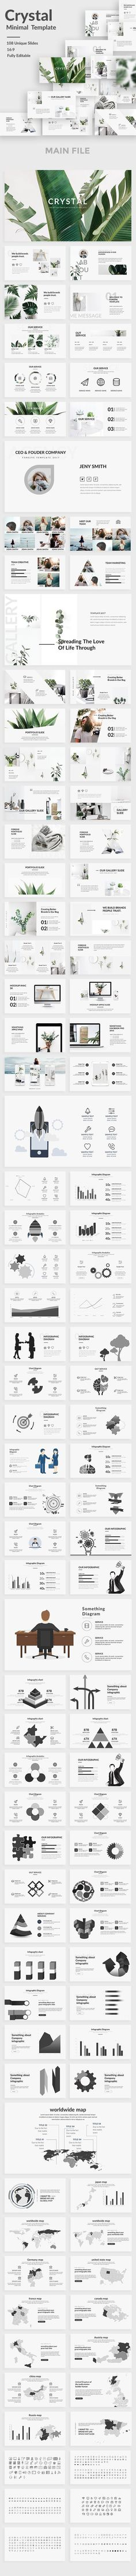 Crystal Minimal Powerpoint Template - Creative PowerPoint Templates